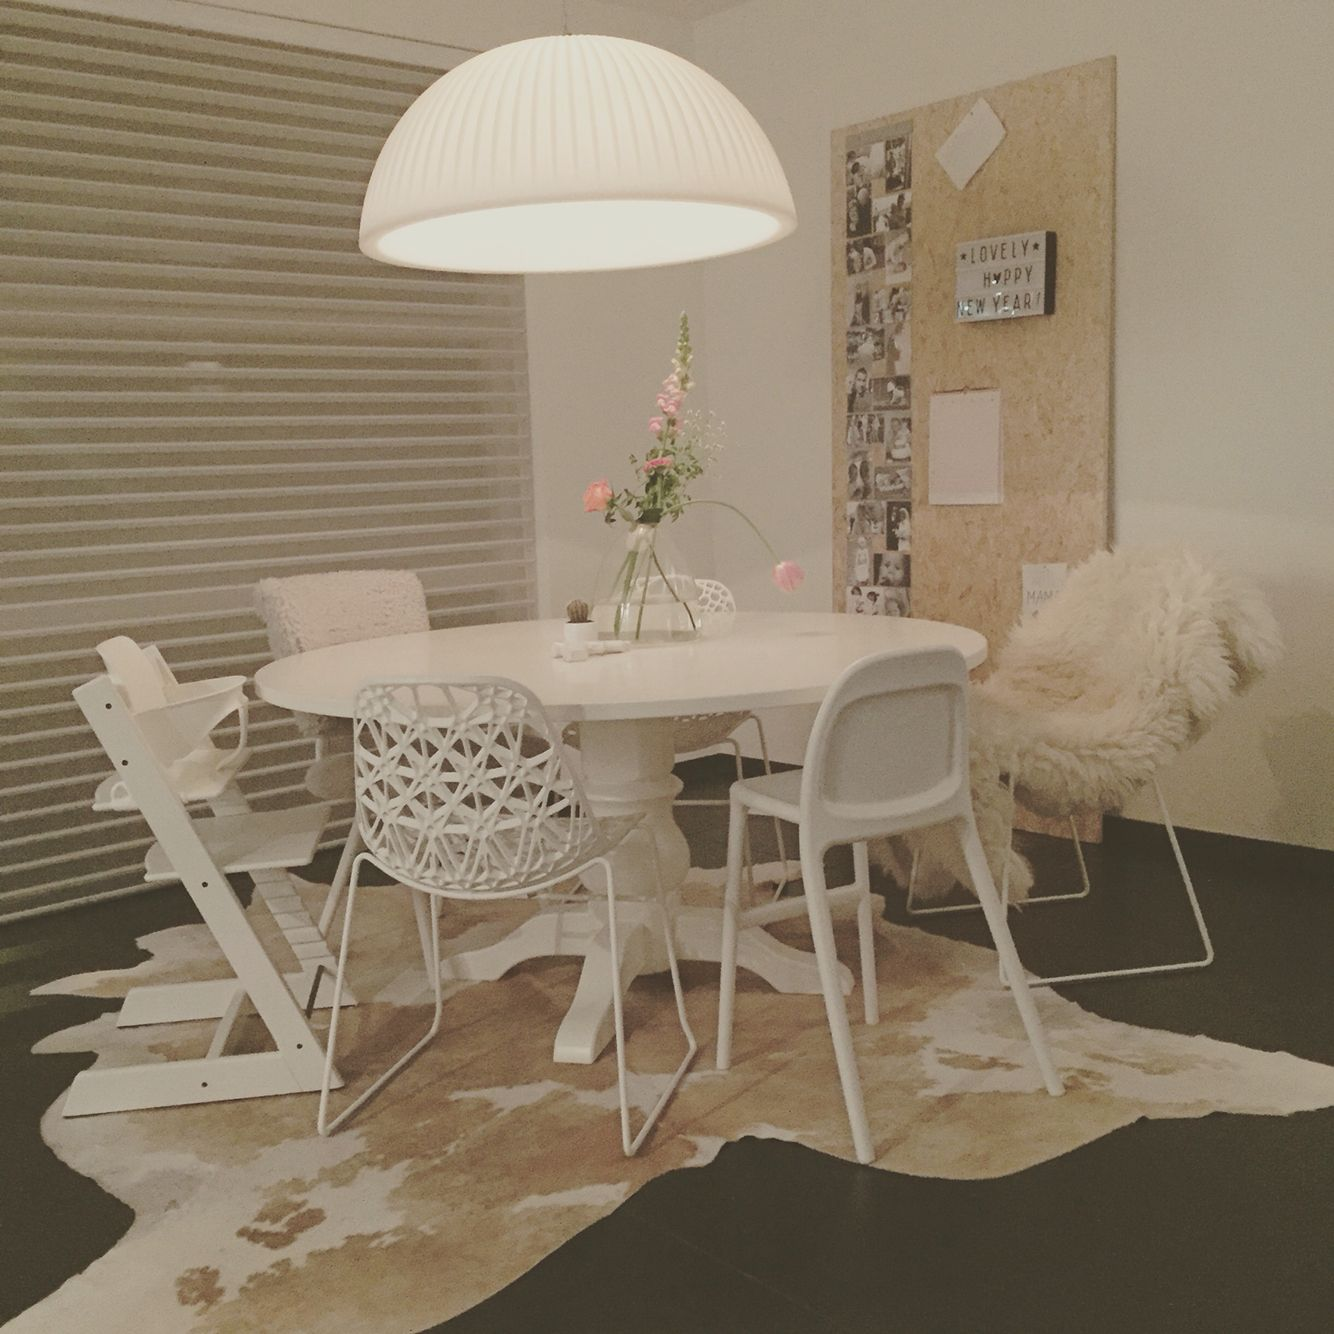 Ronde Witte Tafel Ikea.Ronde Witte Tafel Trots Living Room Tafel Ikea Witte Ronde